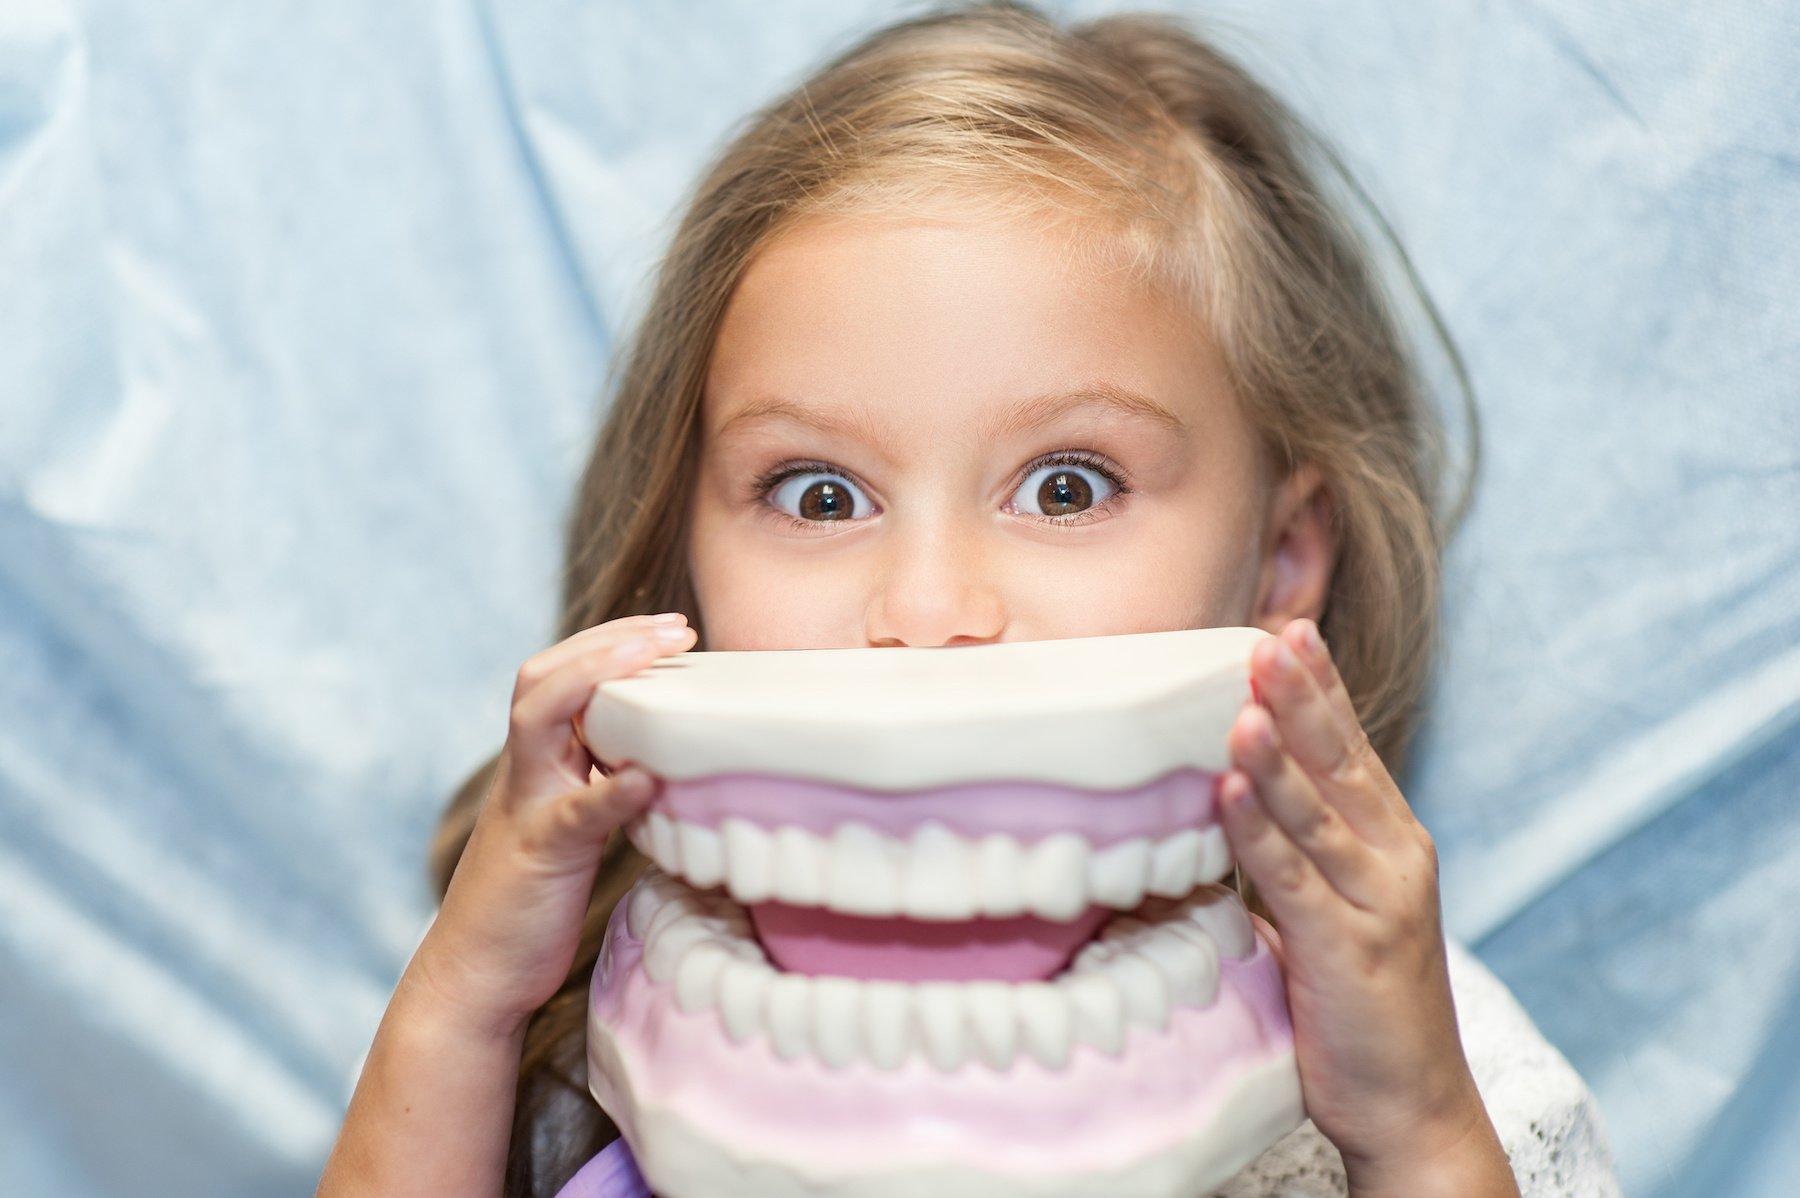 pediatric dentistry family dentistry kids dentist oral health care Dr sandy crocker peter mitchell kelowna